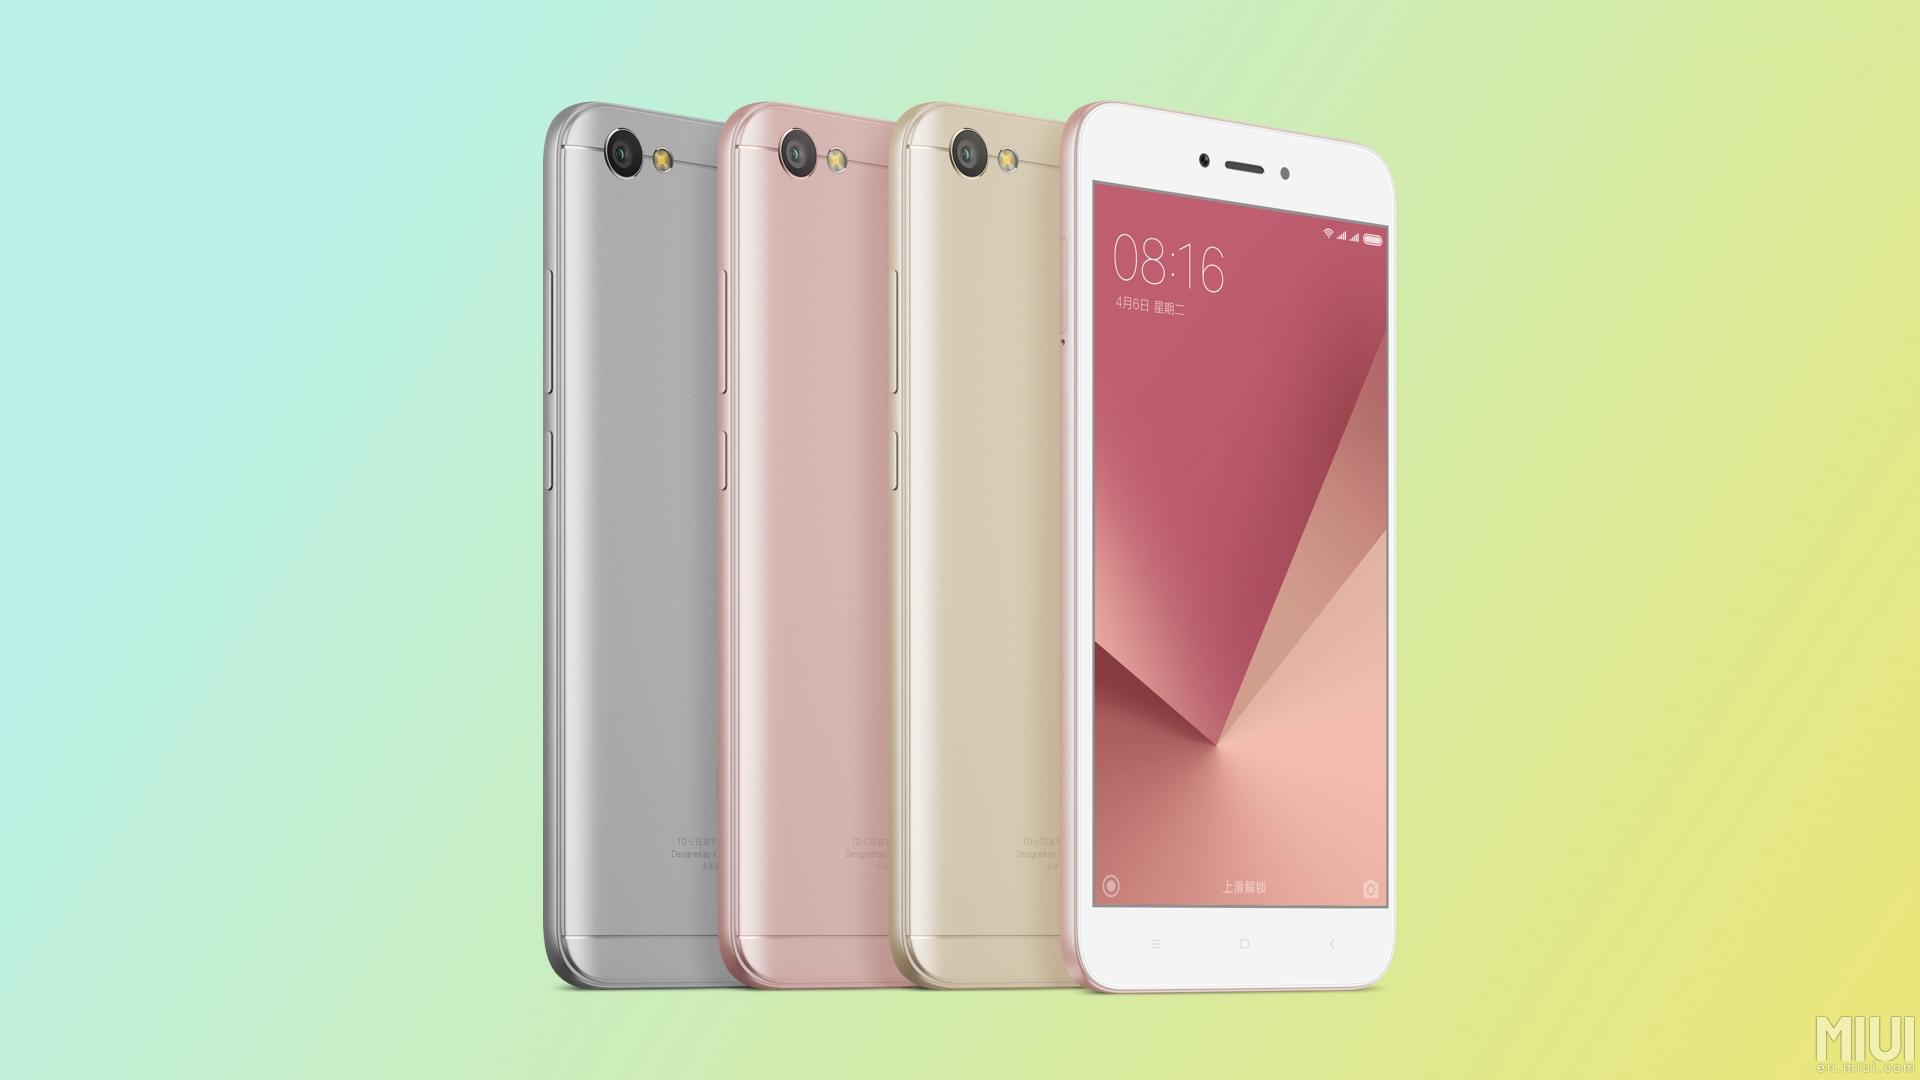 Xiaomi may launch Redmi 5 Plus as Redmi Note 5 in India